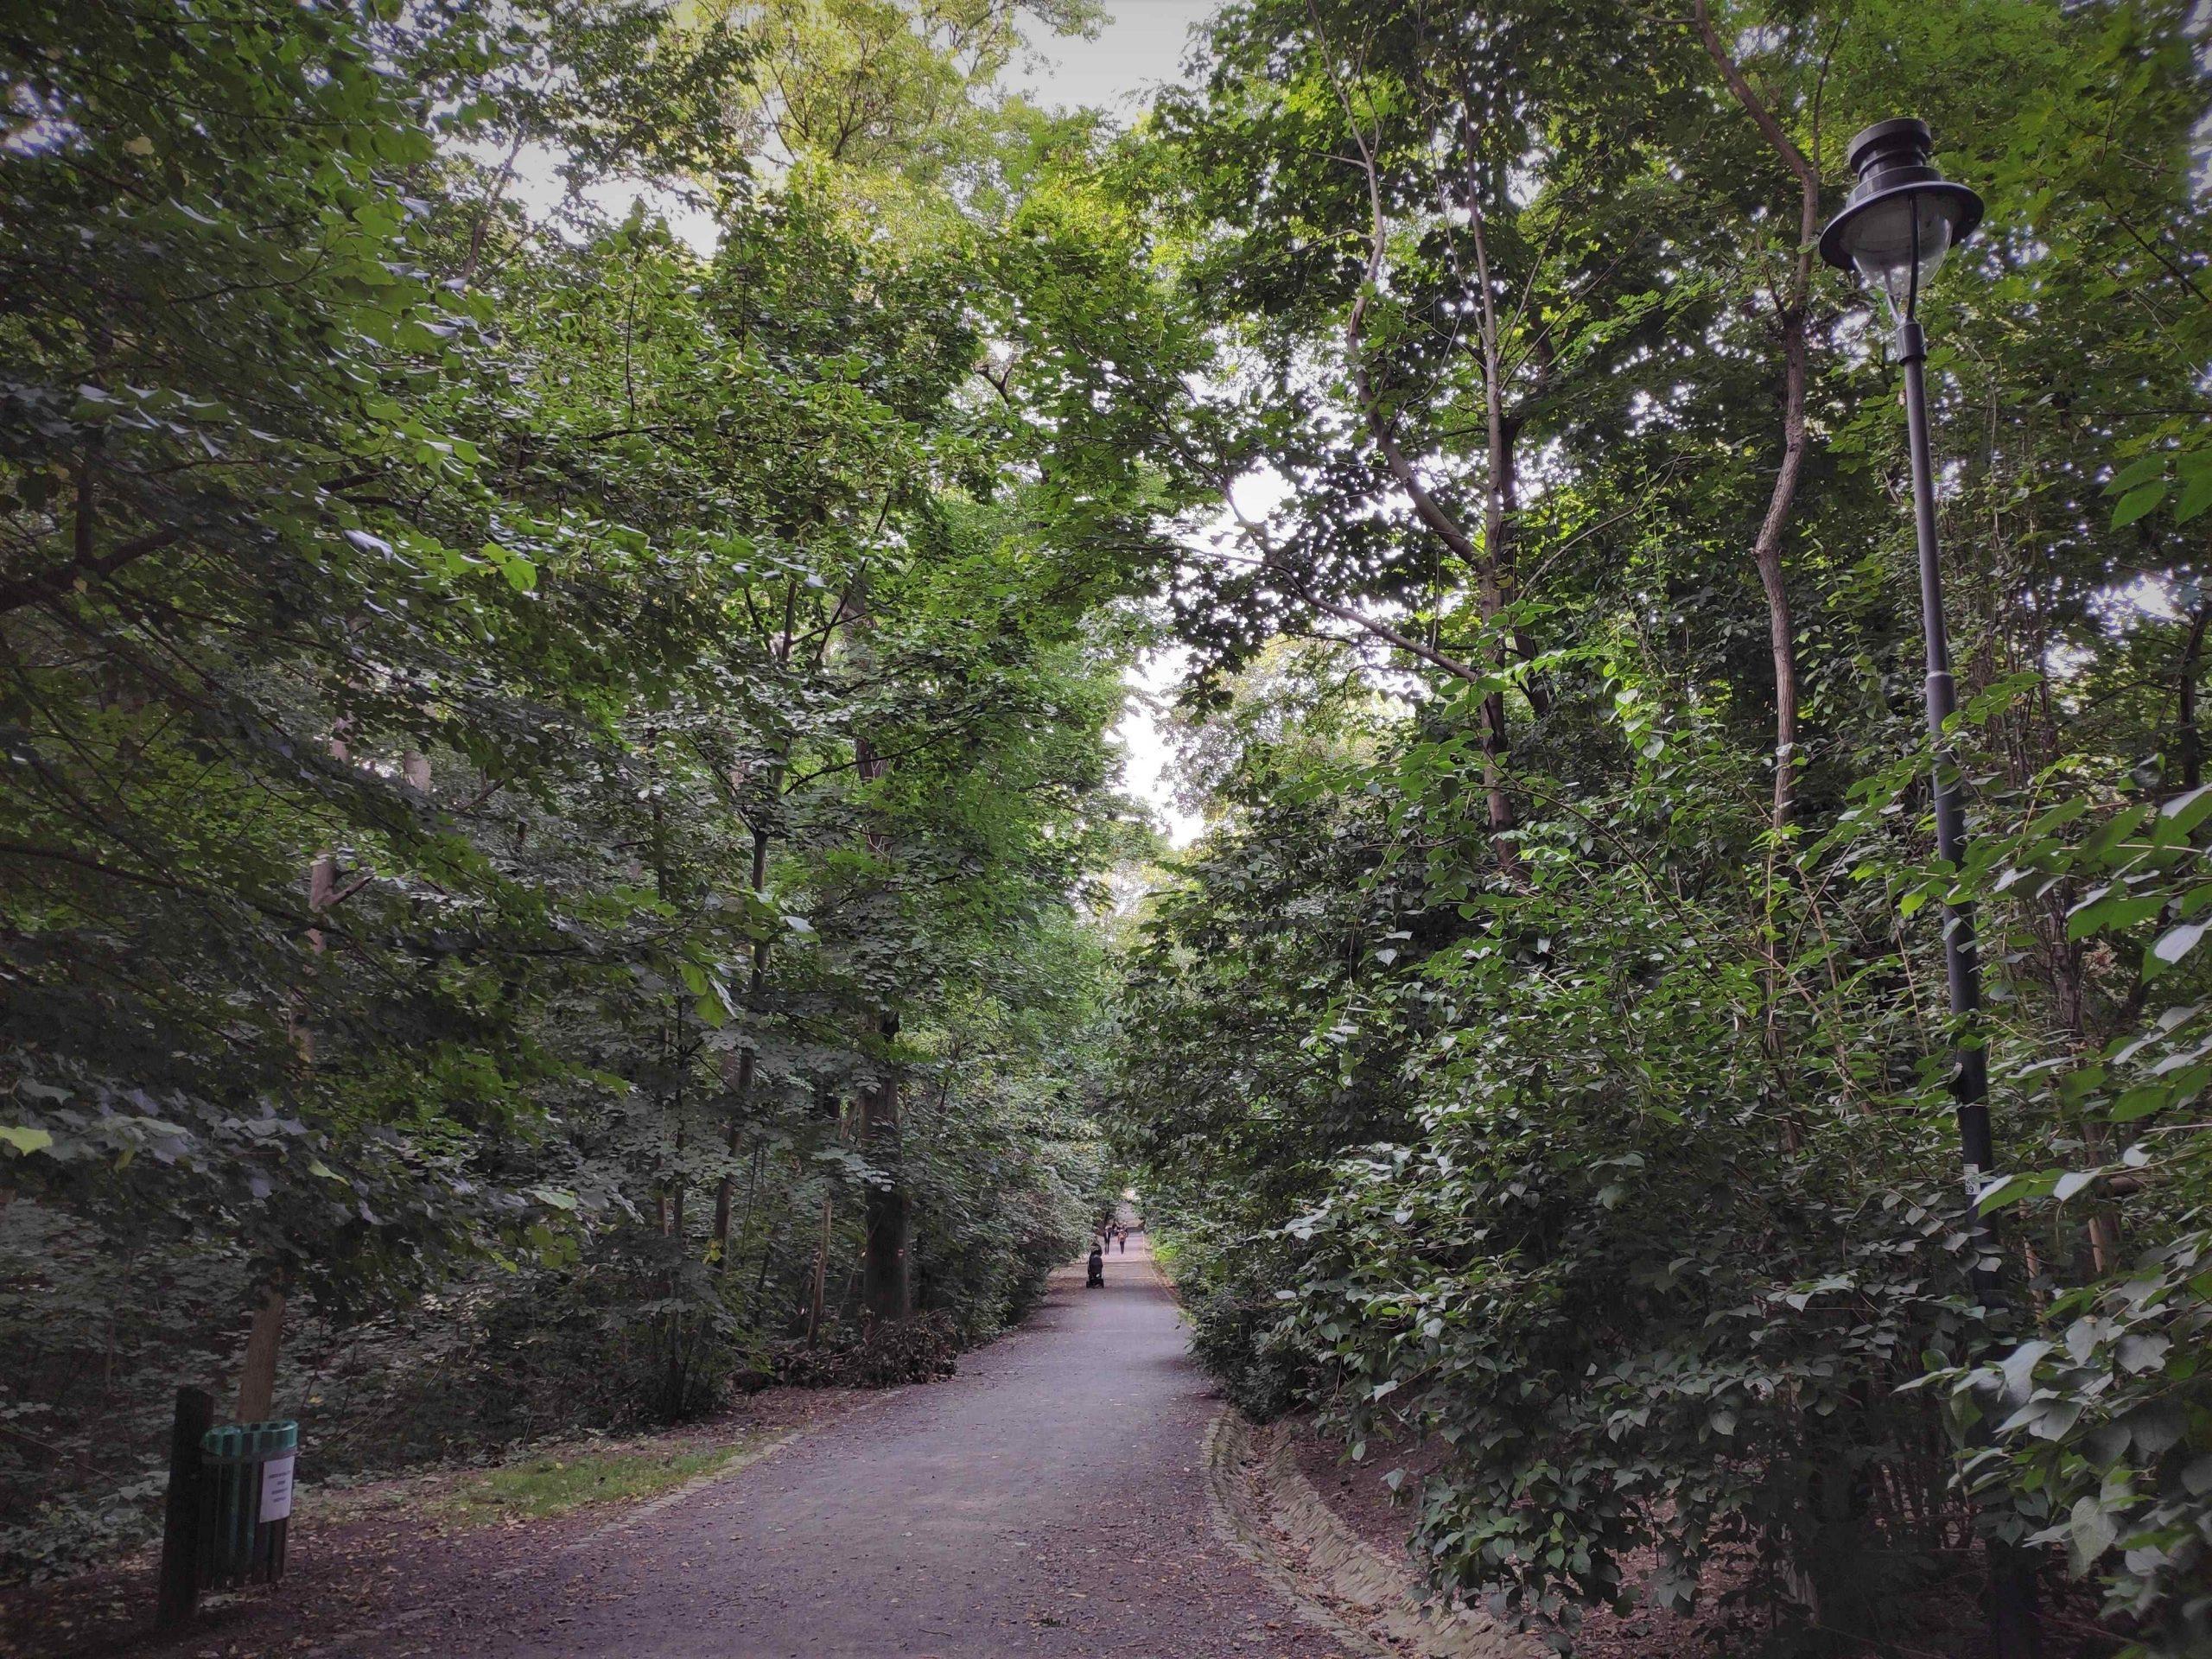 Horaren Horsky park